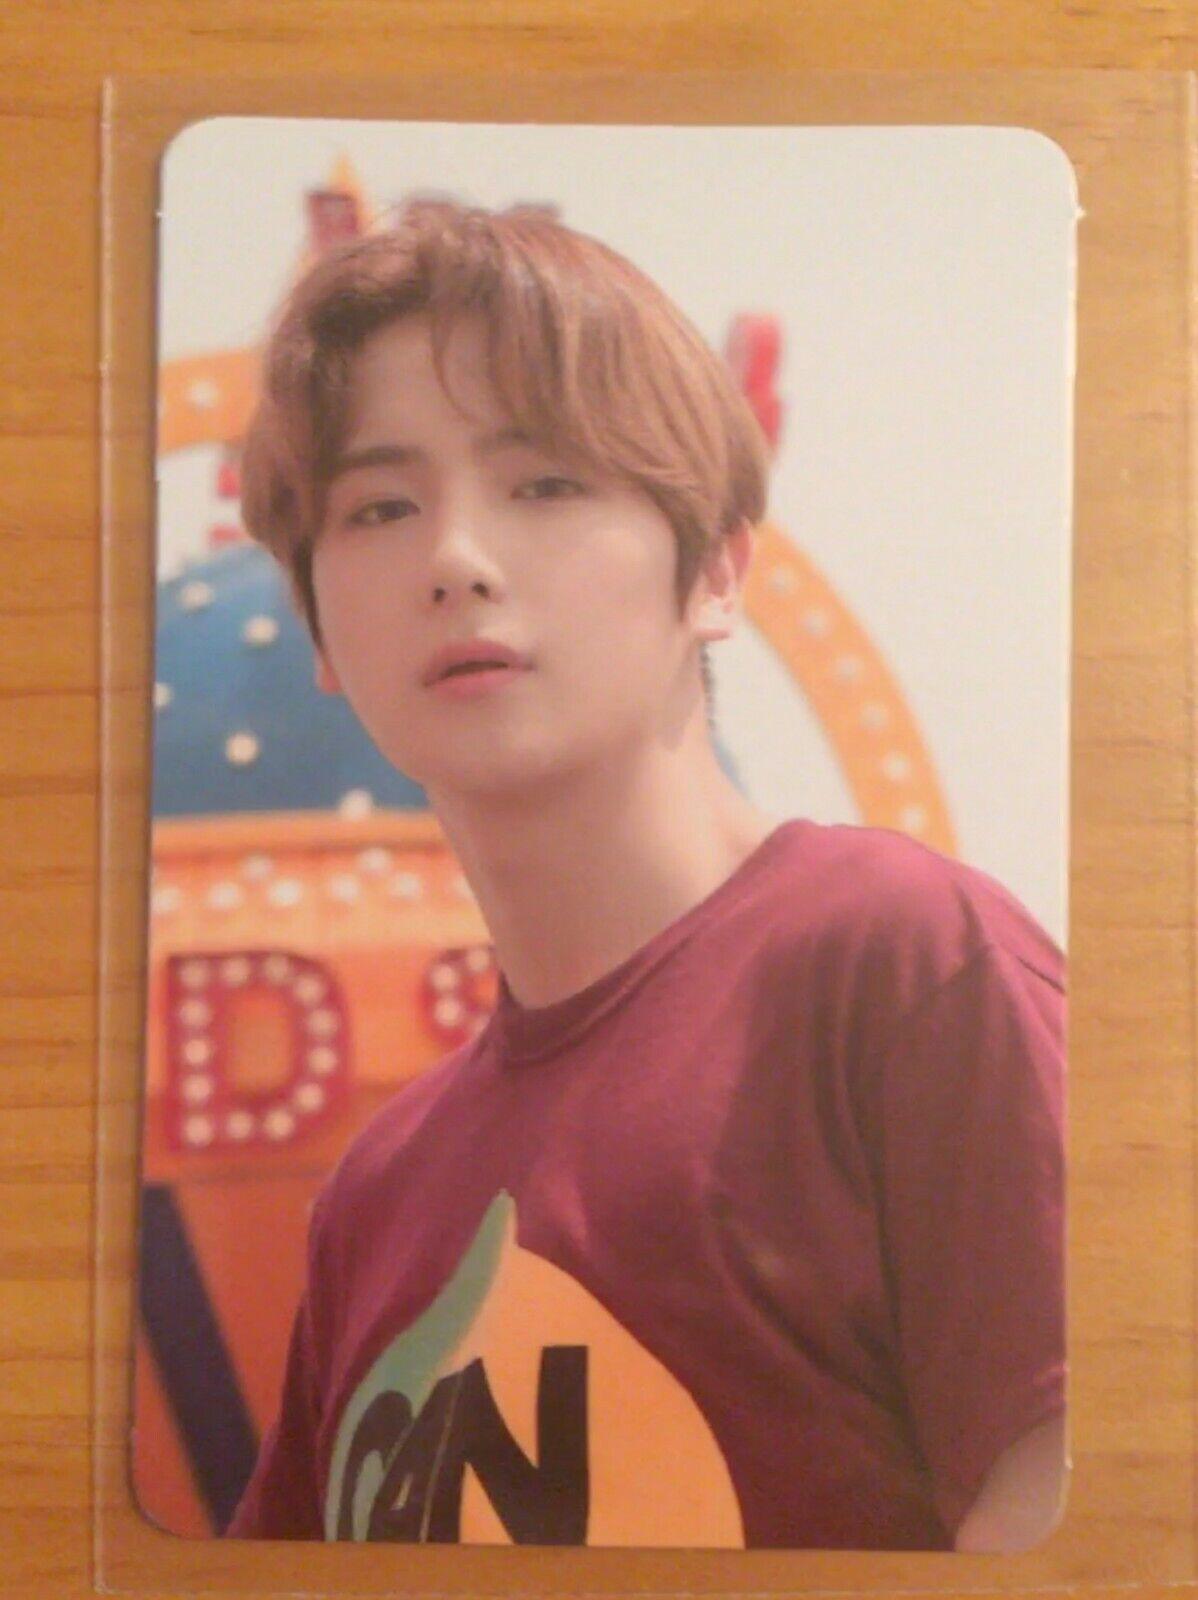 THE BOYZ - DREAMLIKE Official Photocards (MMT -limited- + DREAMLIKE + DAY + DIY) Hyunjae [MMT Signed]